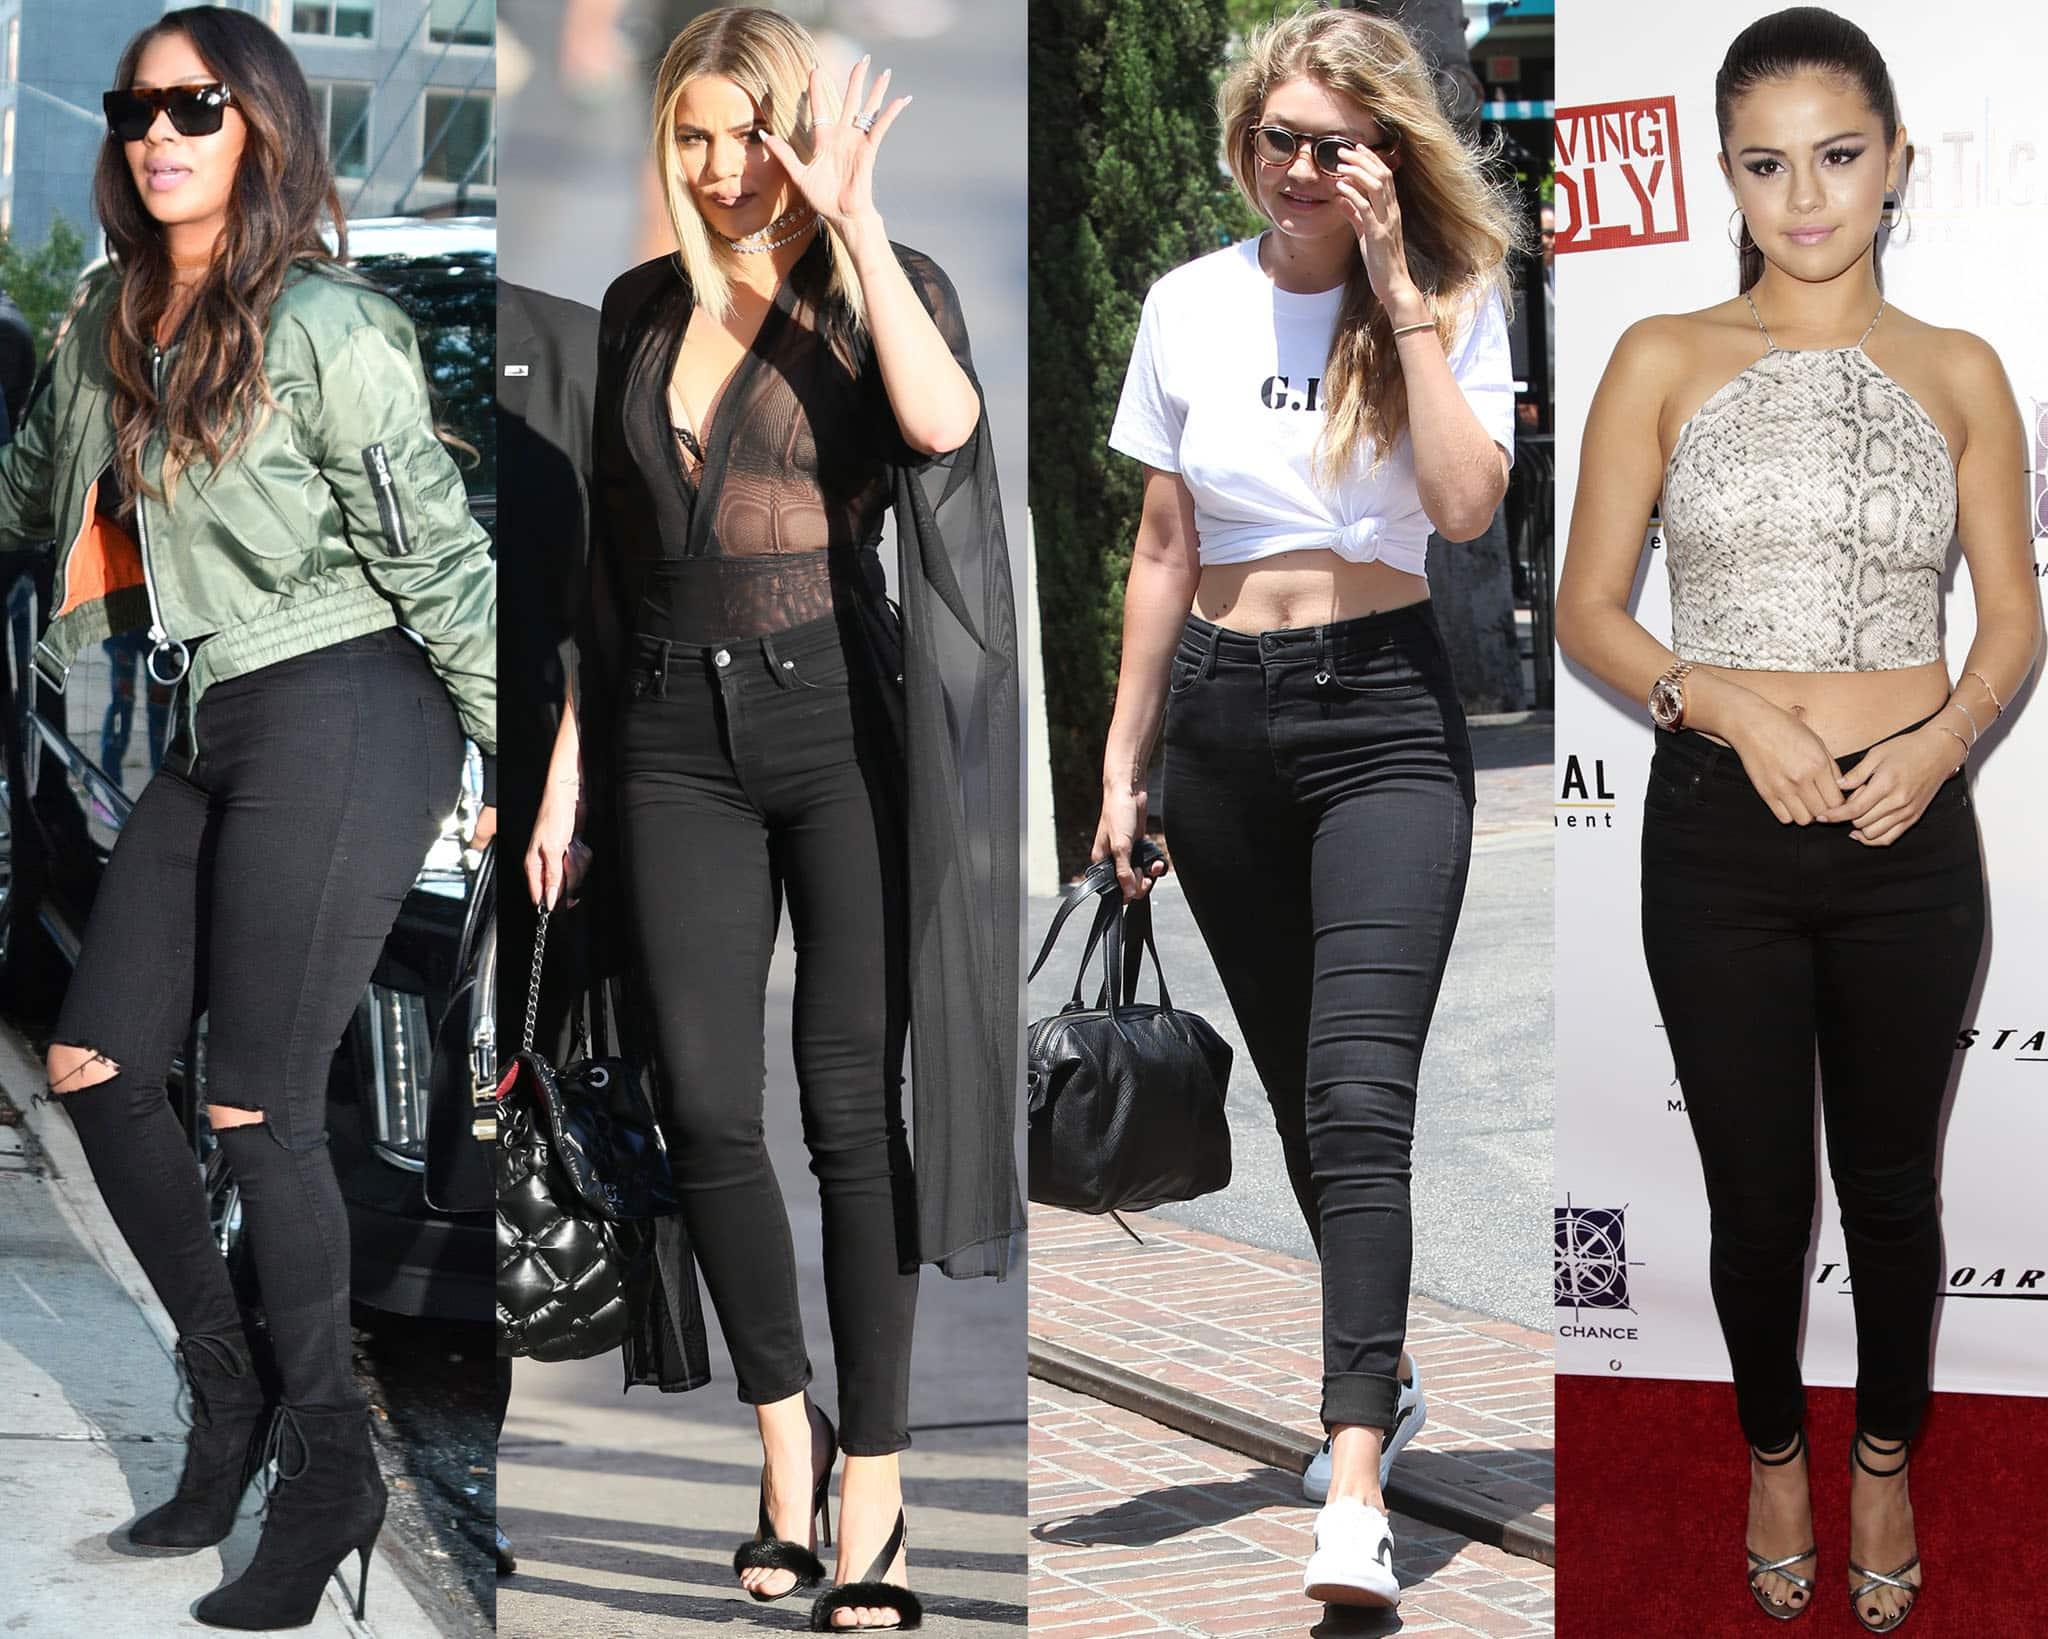 Kim Kardashian, Khloe Kardashian, Gigi Hadid, and Selena Gomez in black skinny jeans